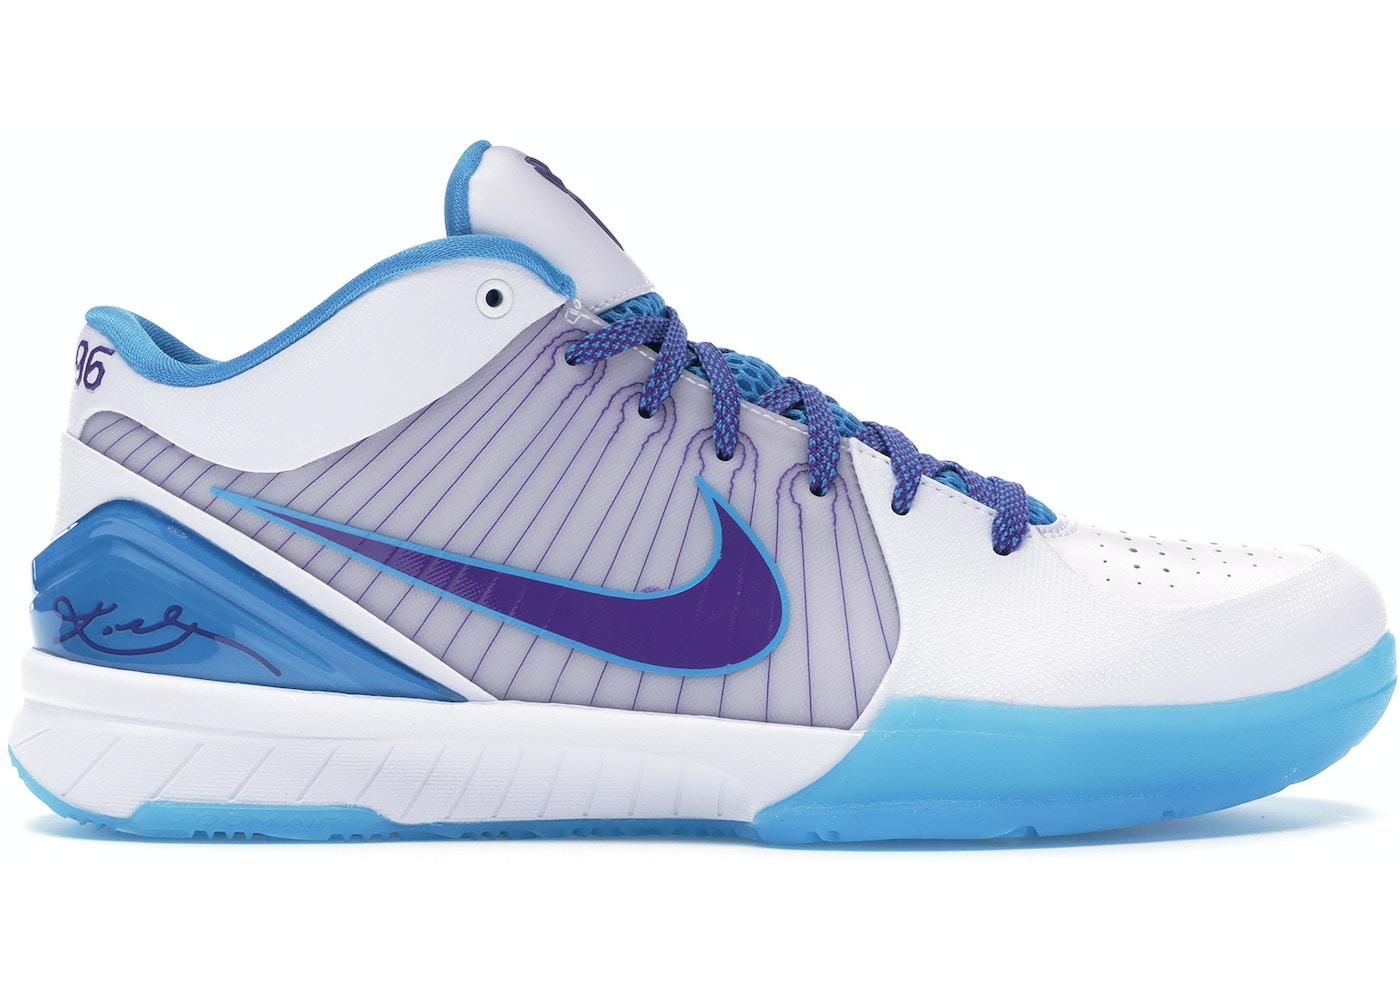 newest 25e55 34ccb Buy Nike Kobe Shoes   Deadstock Sneakers